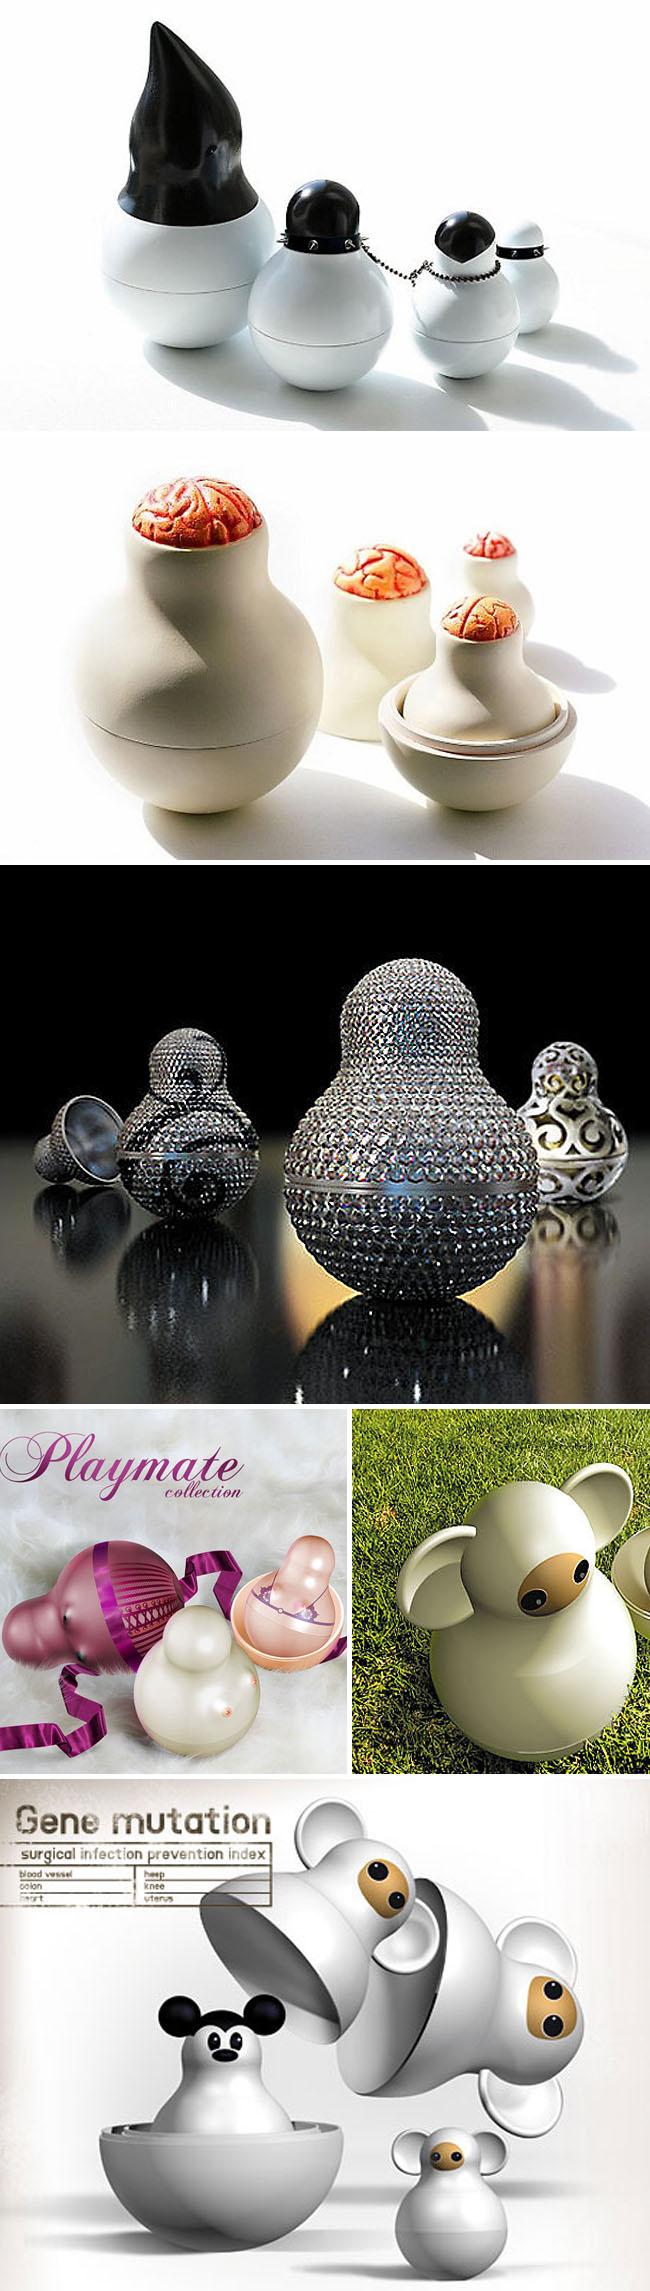 Matroyshka, Contemporary Russian Nesting Dolls, Toys, Batman, Russian Design, collabcubed